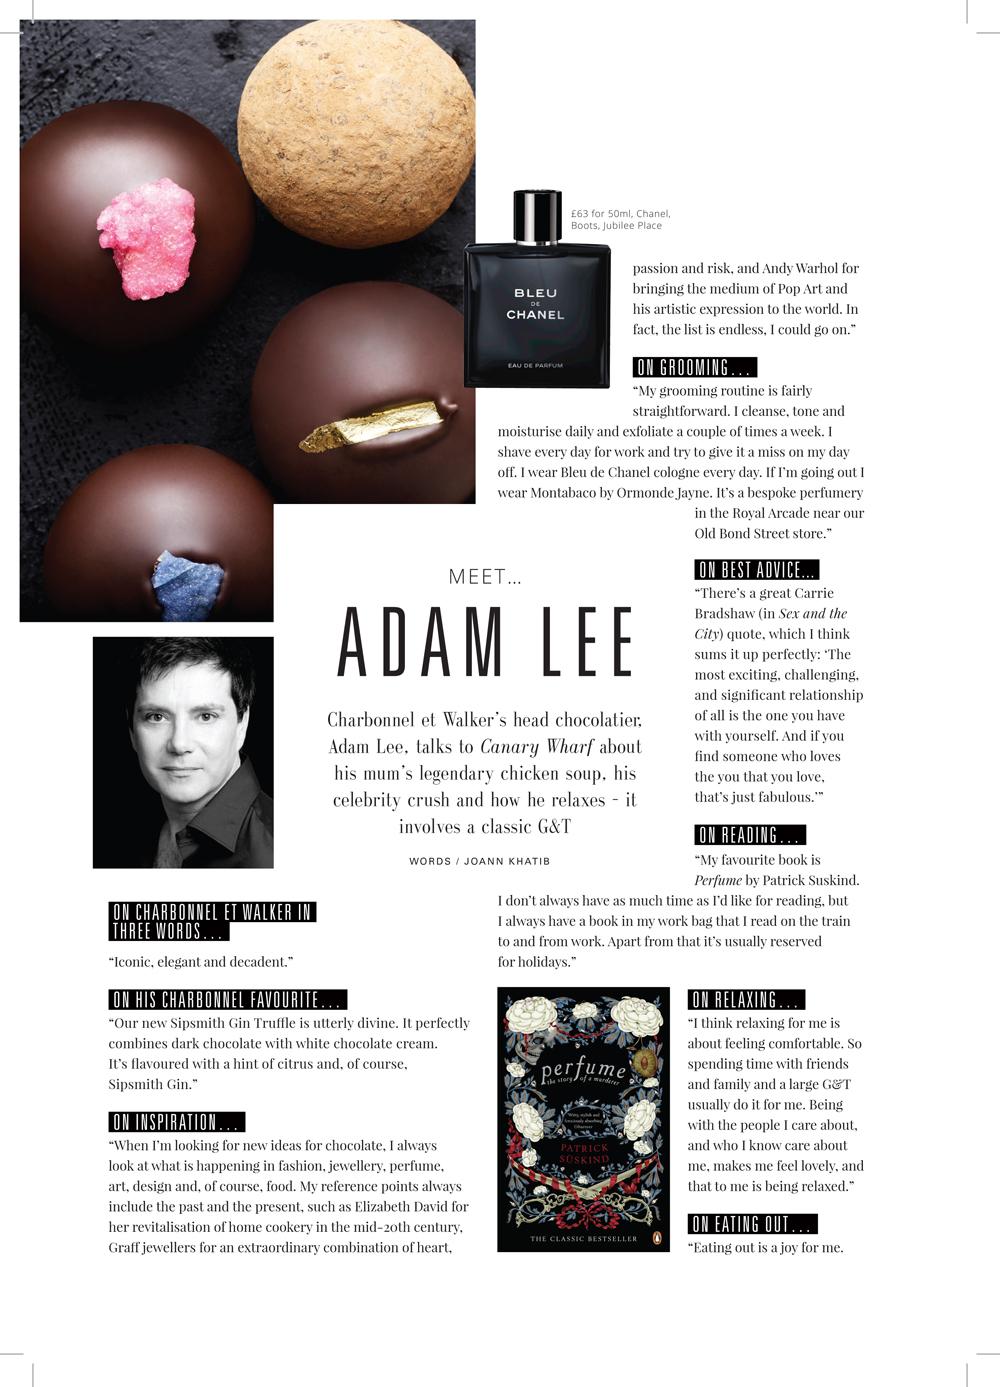 Adam Lee in Canary Wharf Magazine